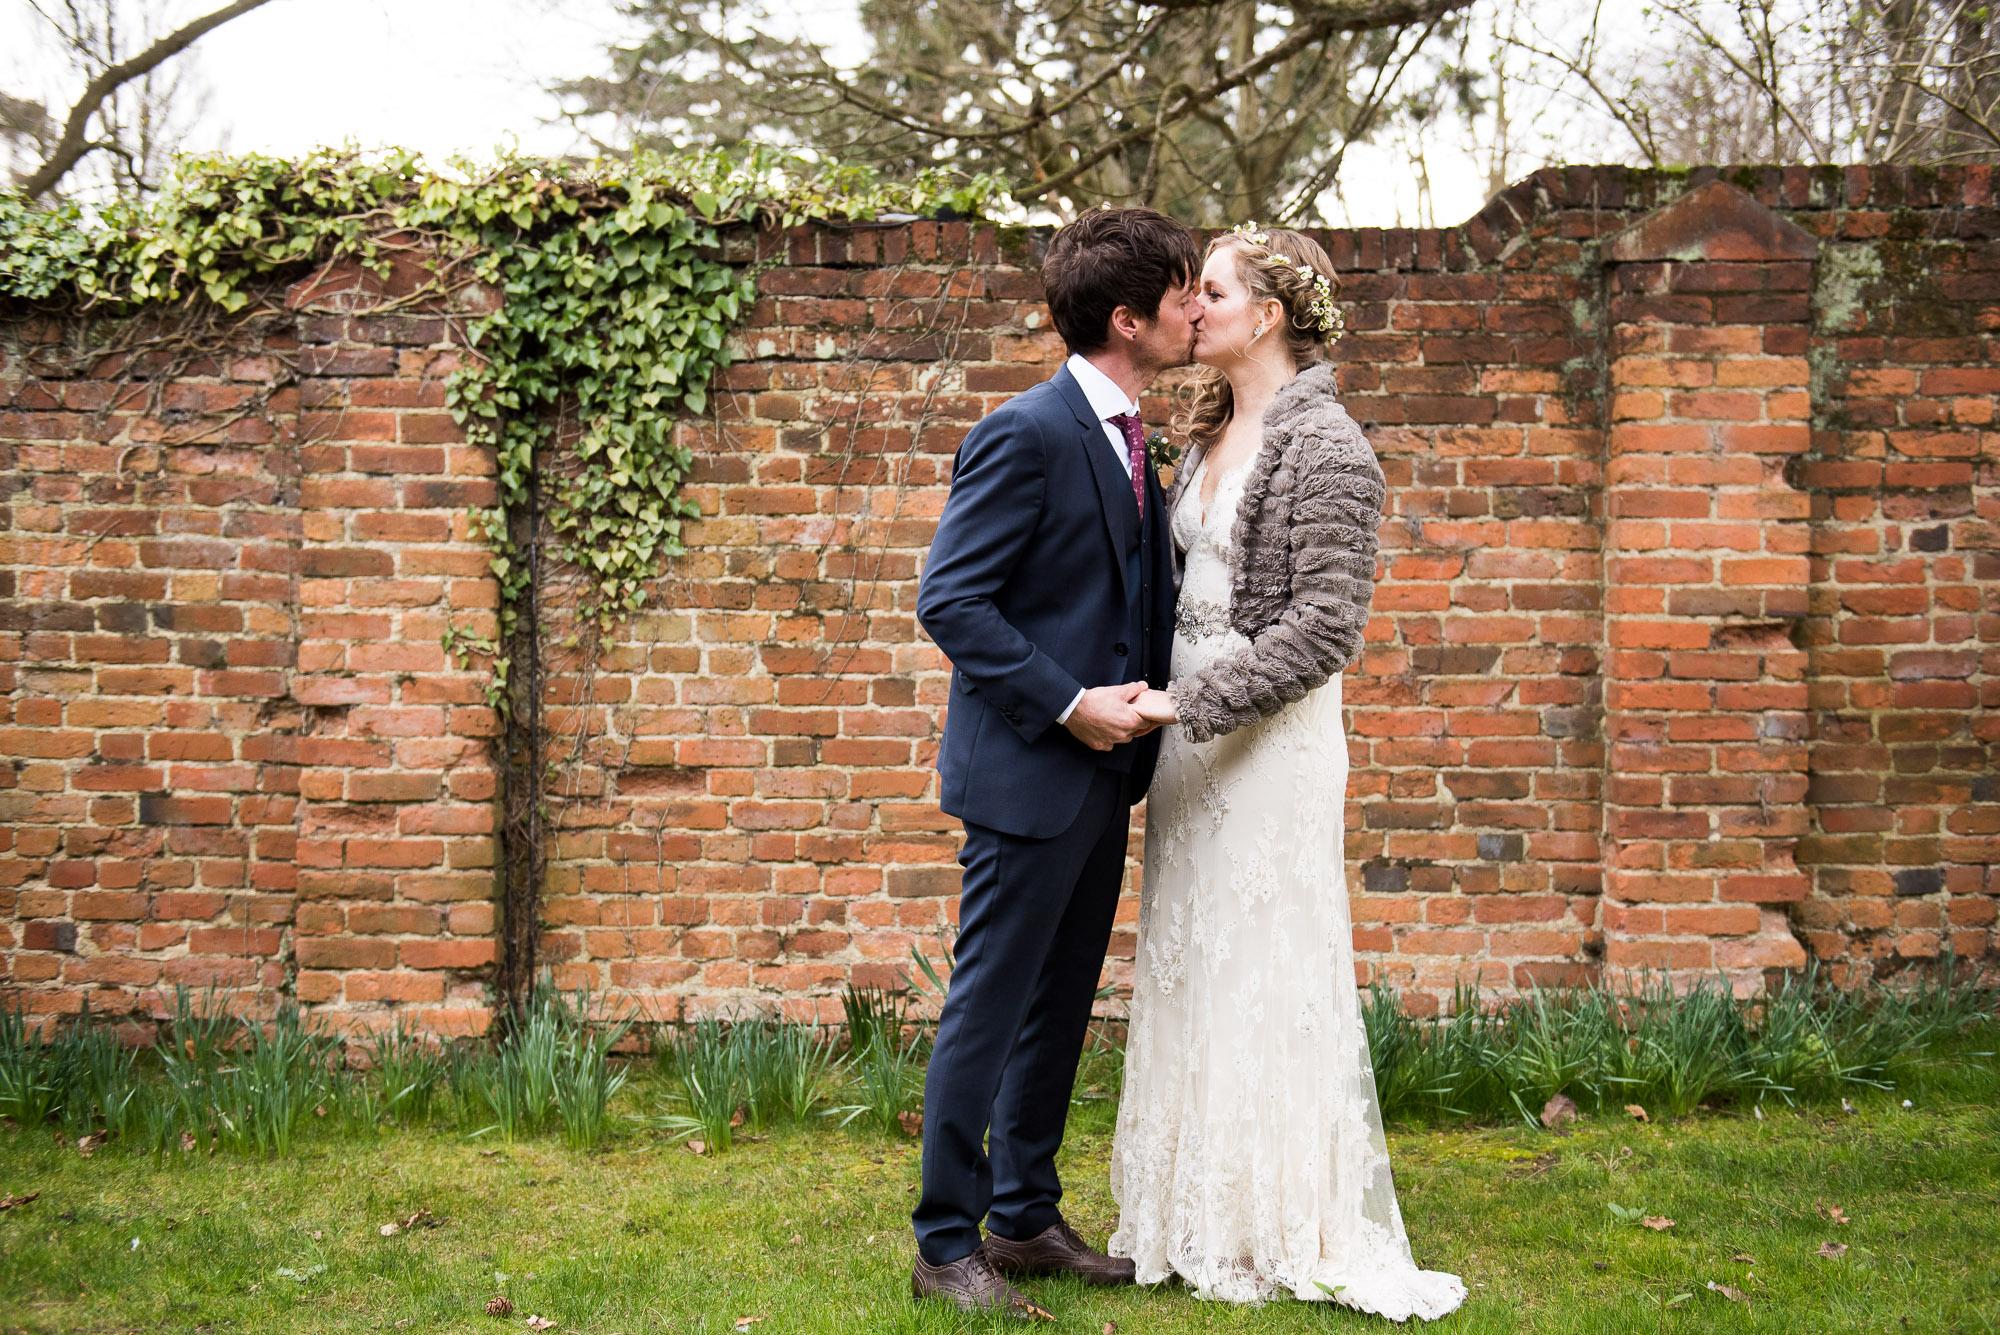 natural wedding photography Essex barn wedding